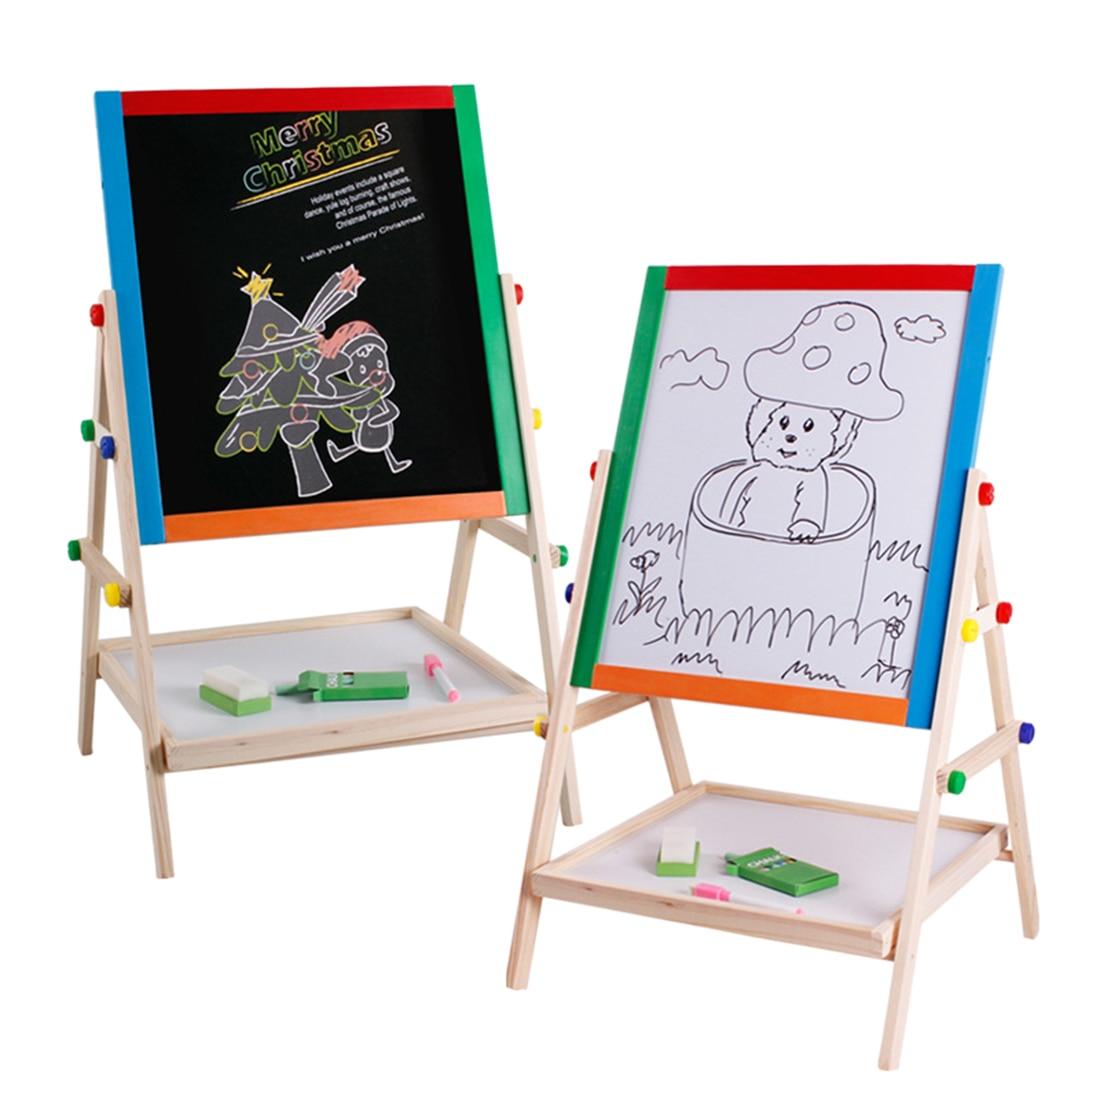 LED Music Kids Easel Art Supplies Double Sided Childrens Easel Chalkboard Magnet